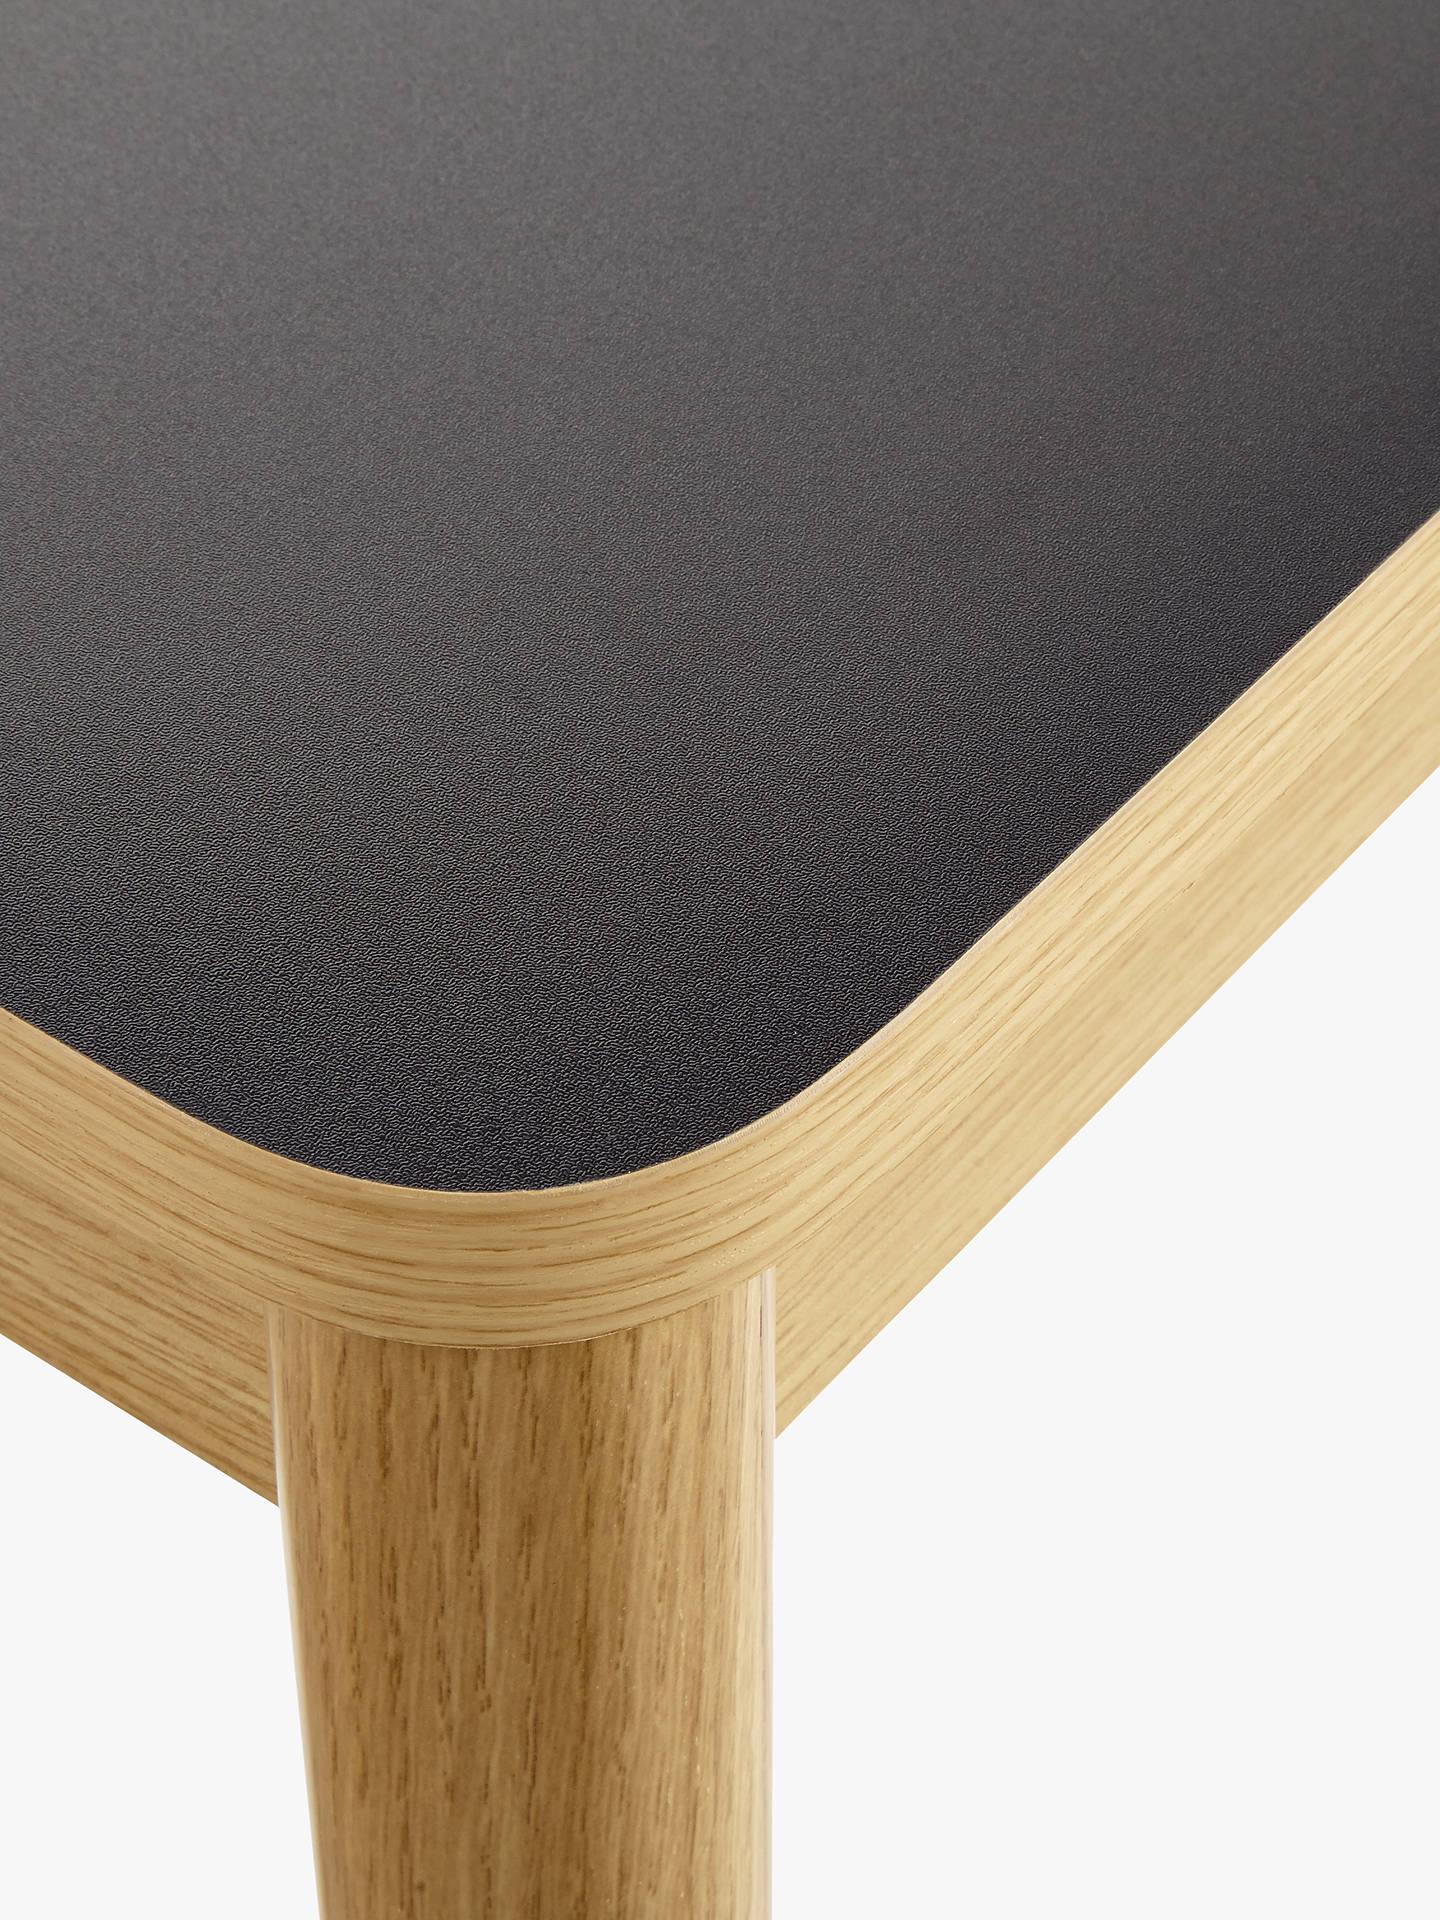 Tremendous John Lewis Peyton 3 Seater Dining Bench Theyellowbook Wood Chair Design Ideas Theyellowbookinfo